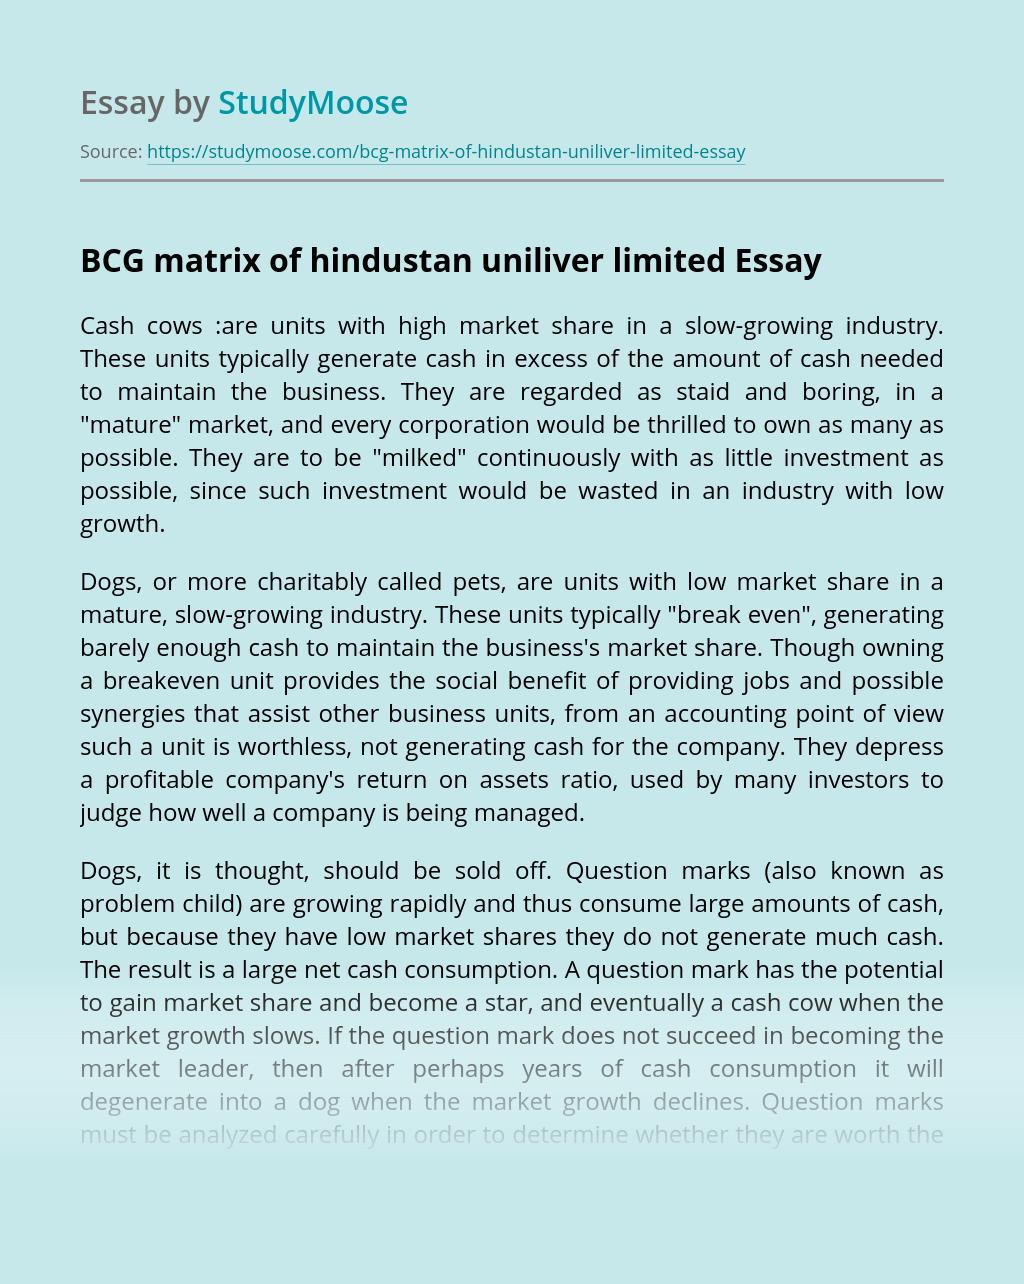 BCG matrix of hindustan uniliver limited